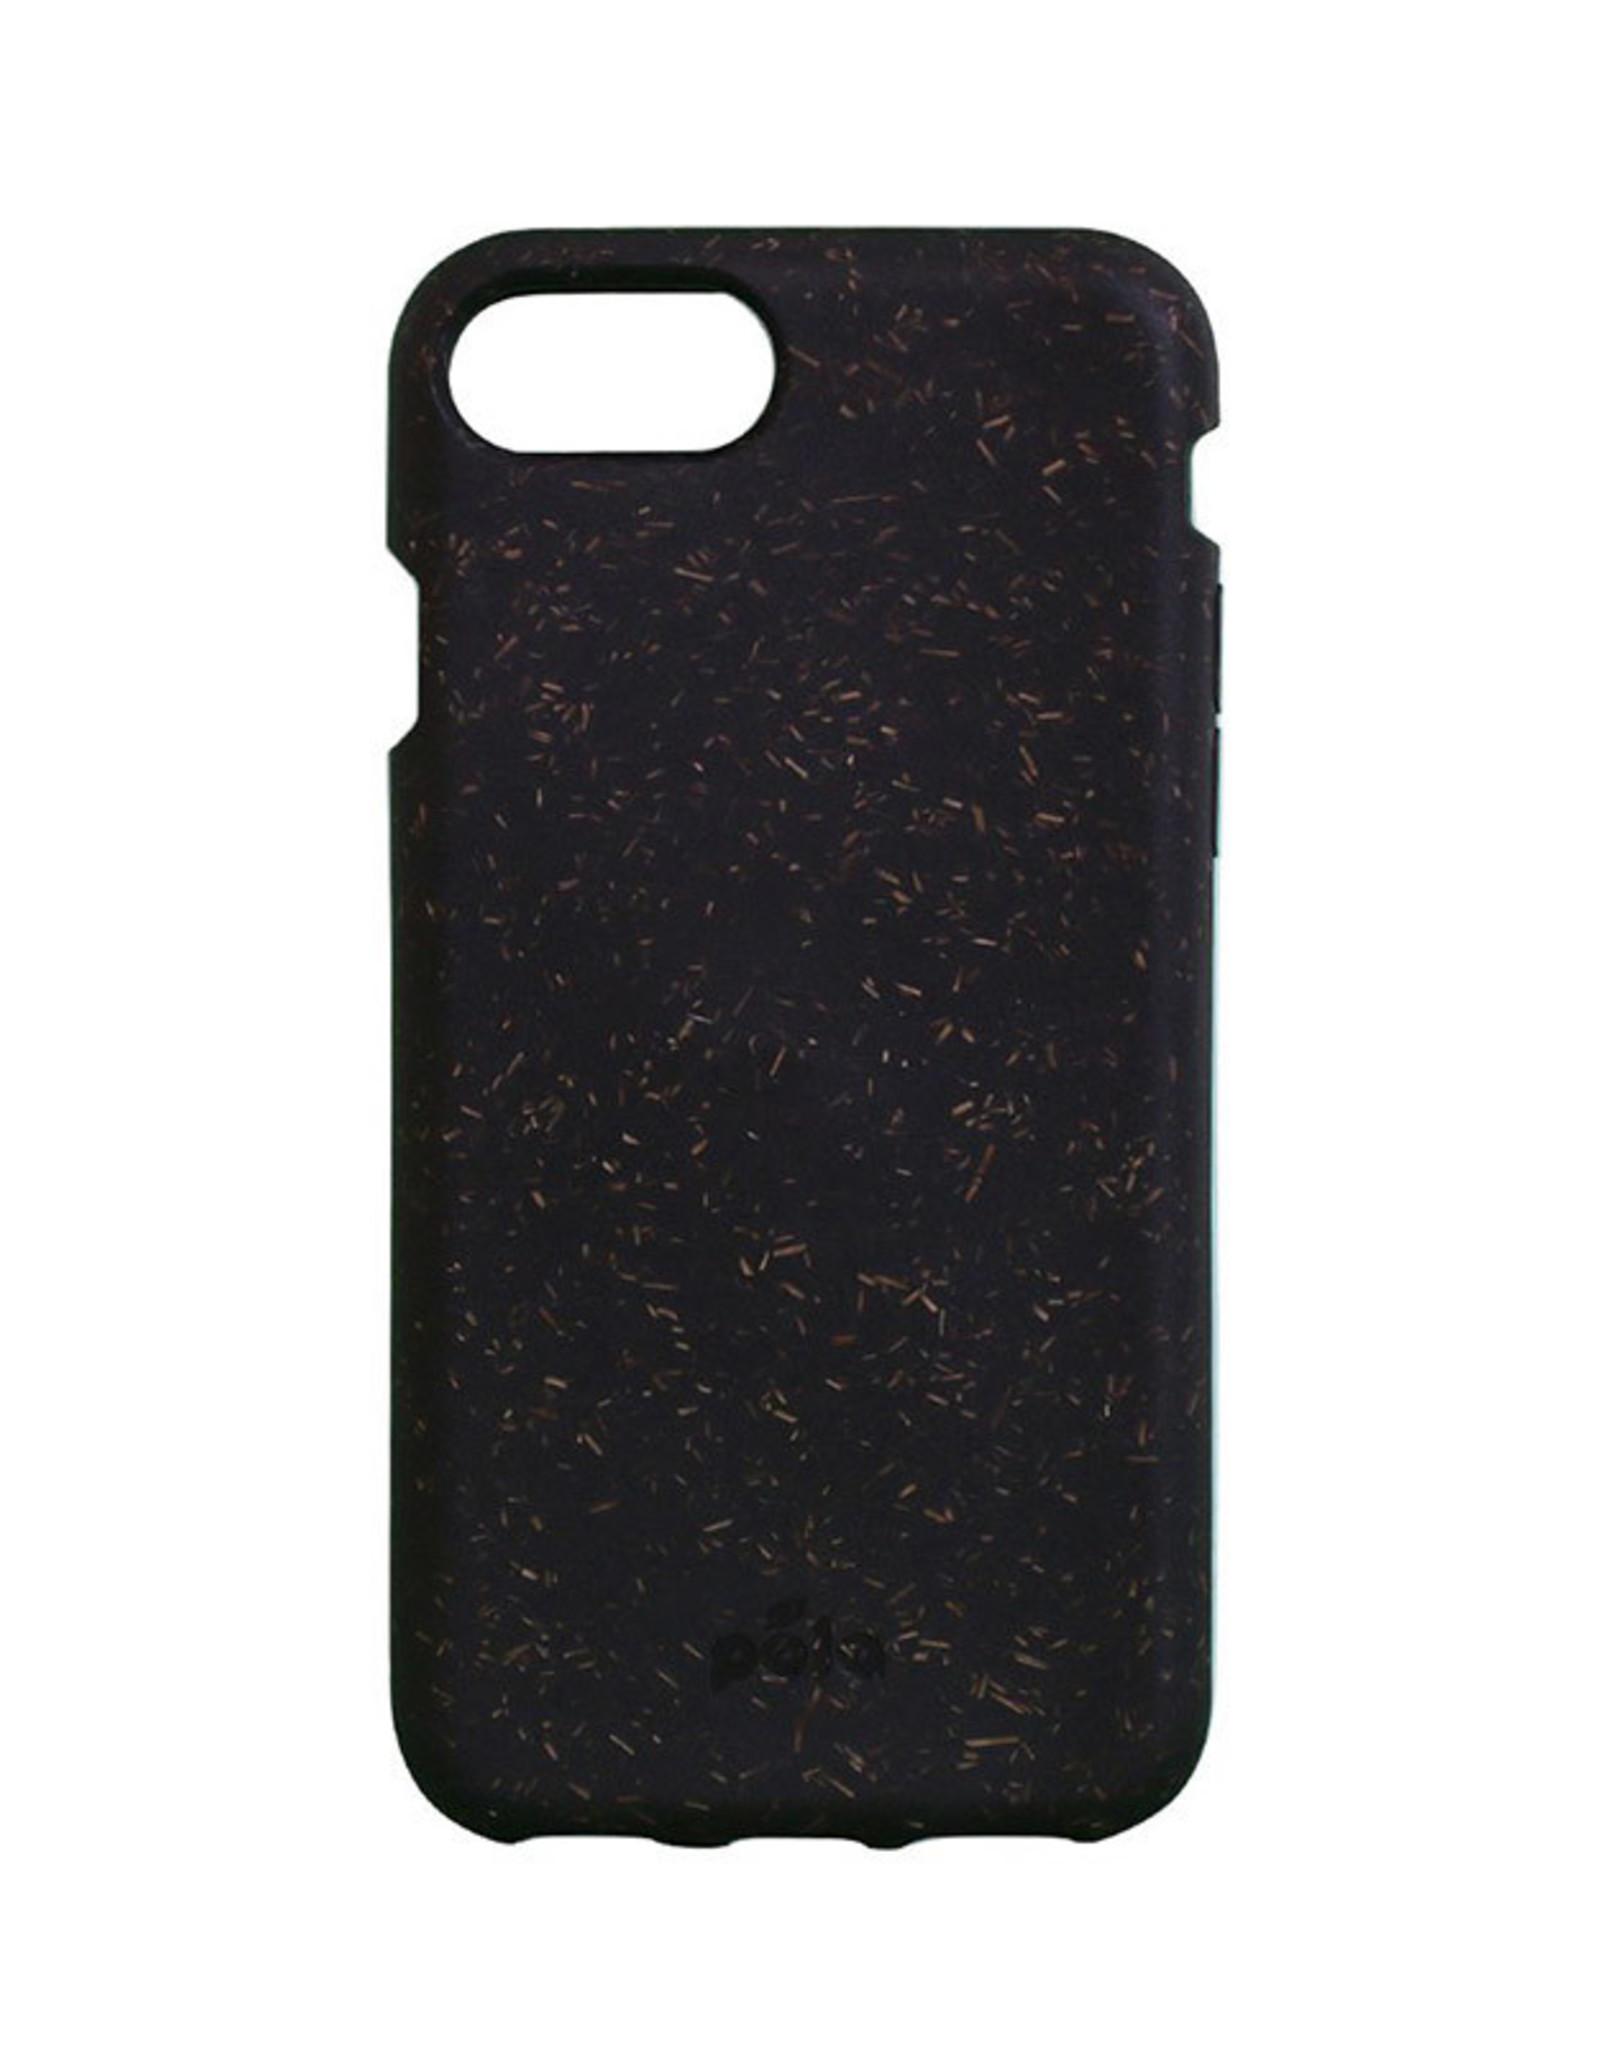 Pela Pela iPhone 6/6s/7/8 Case